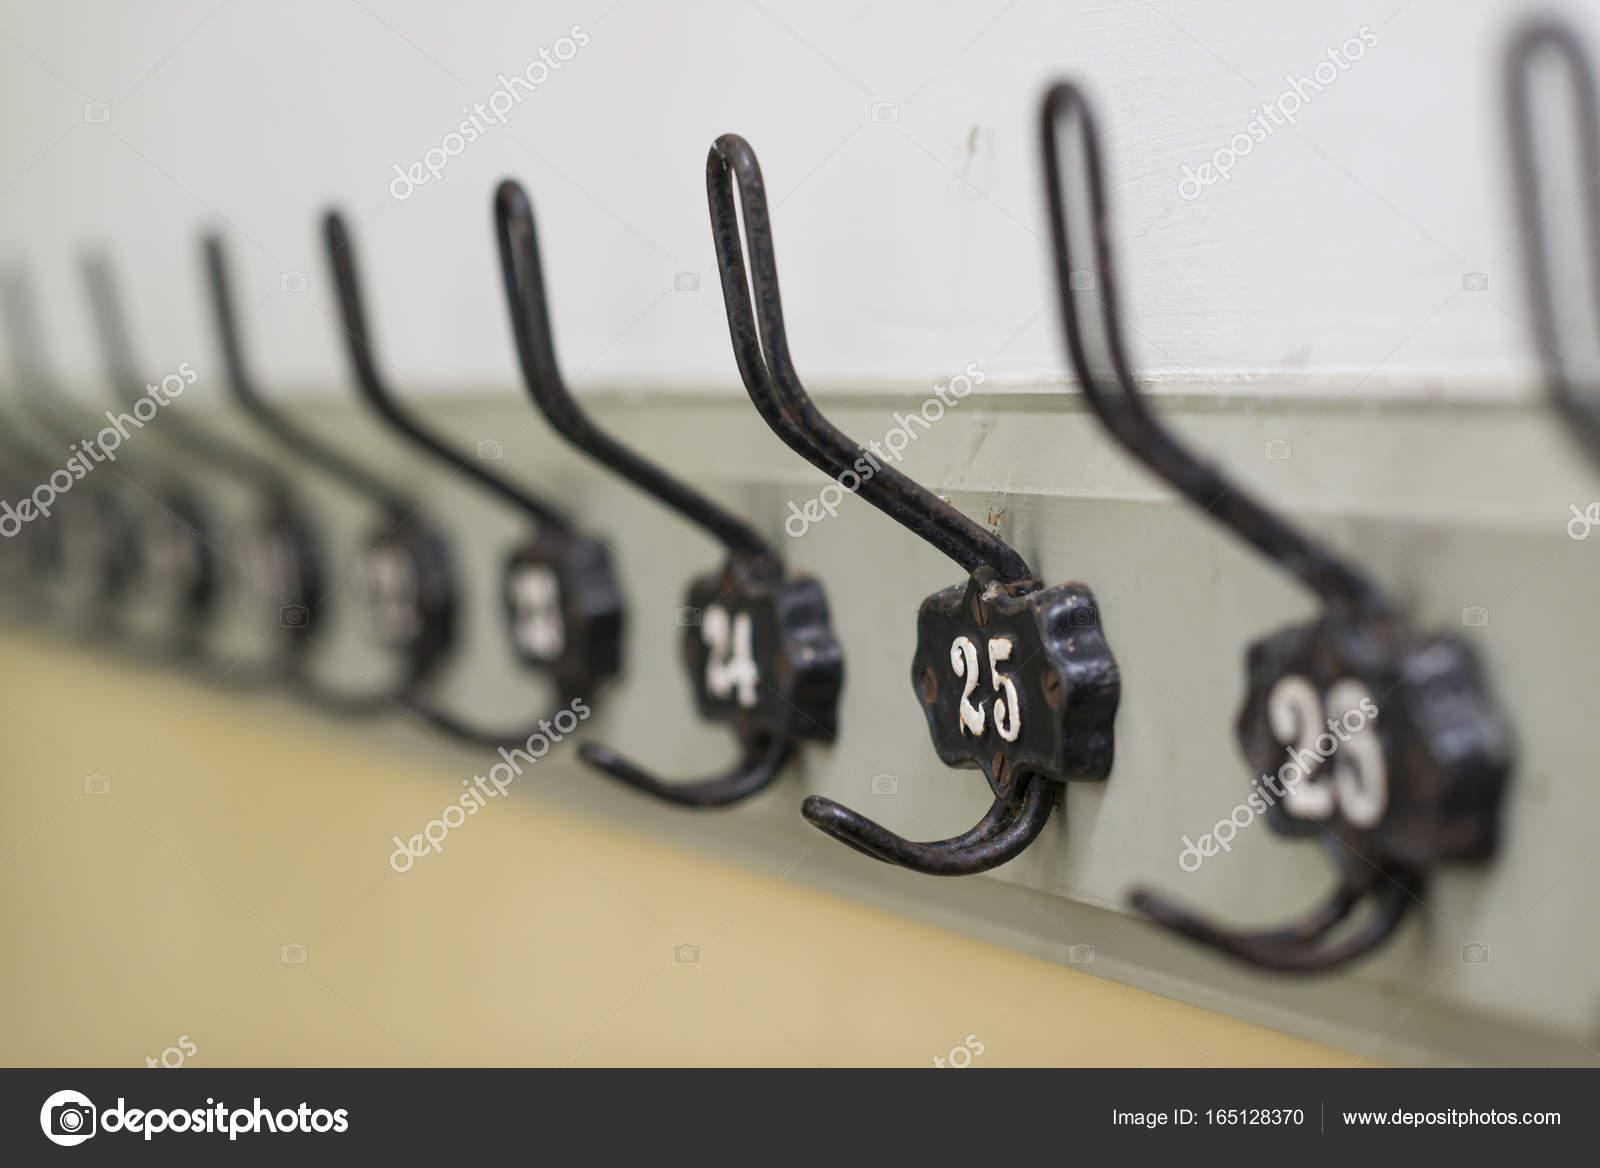 Ongebruikt Ouderwetse kapstok — Stockfoto © tofotografie #165128370 BF-08